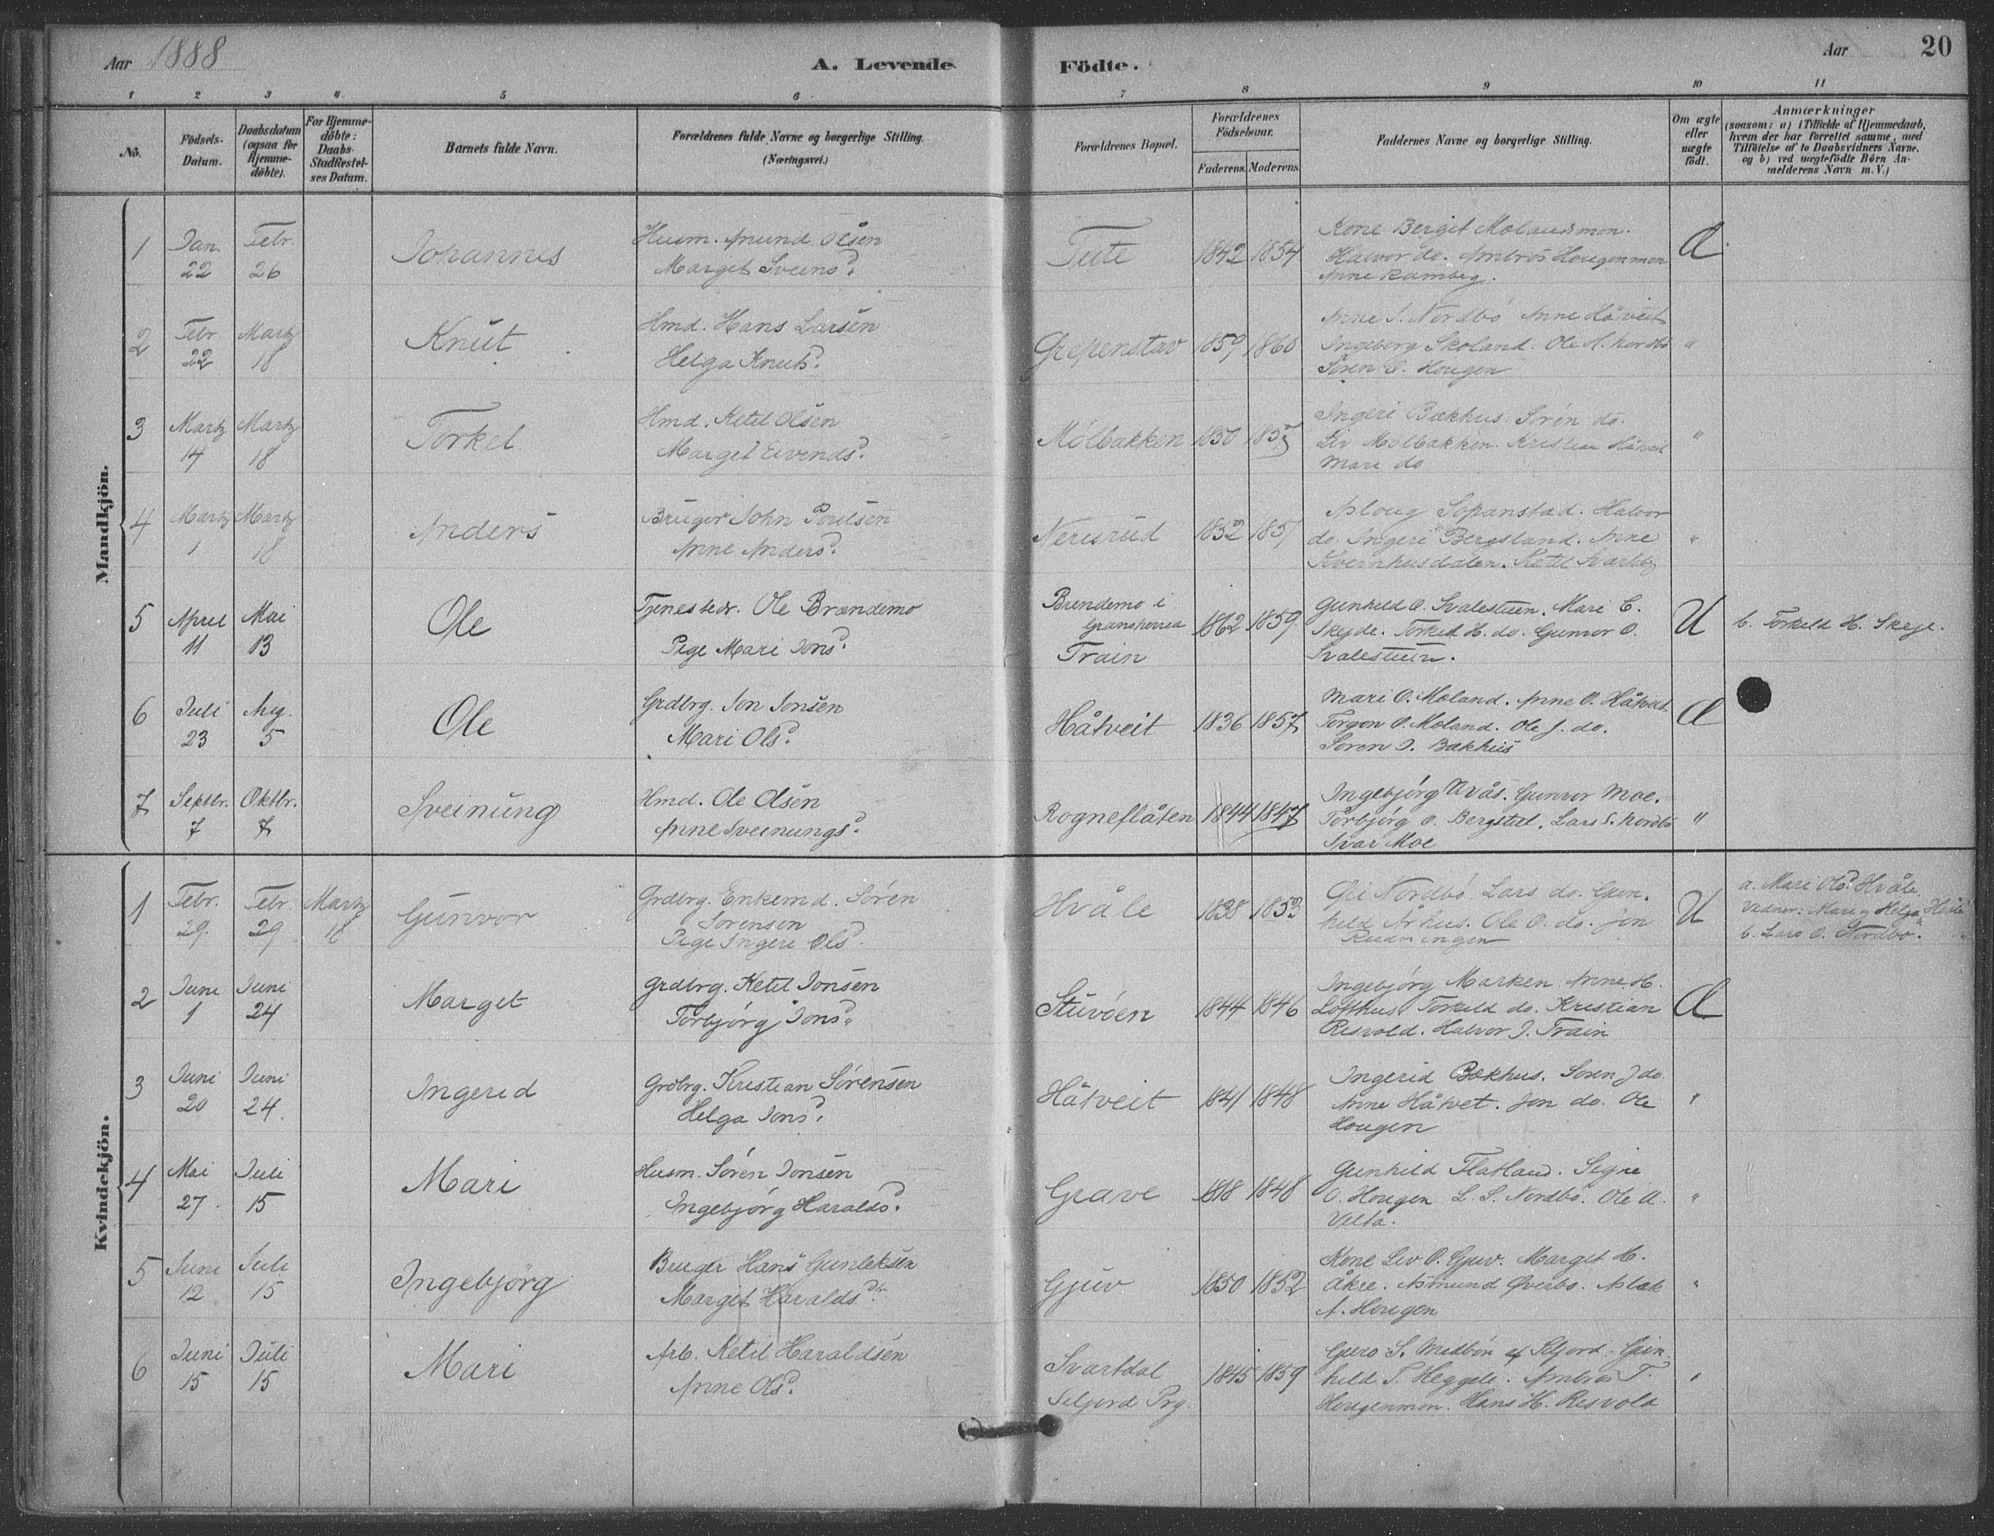 SAKO, Hjartdal kirkebøker, F/Fa/L0010: Ministerialbok nr. I 10, 1880-1929, s. 20